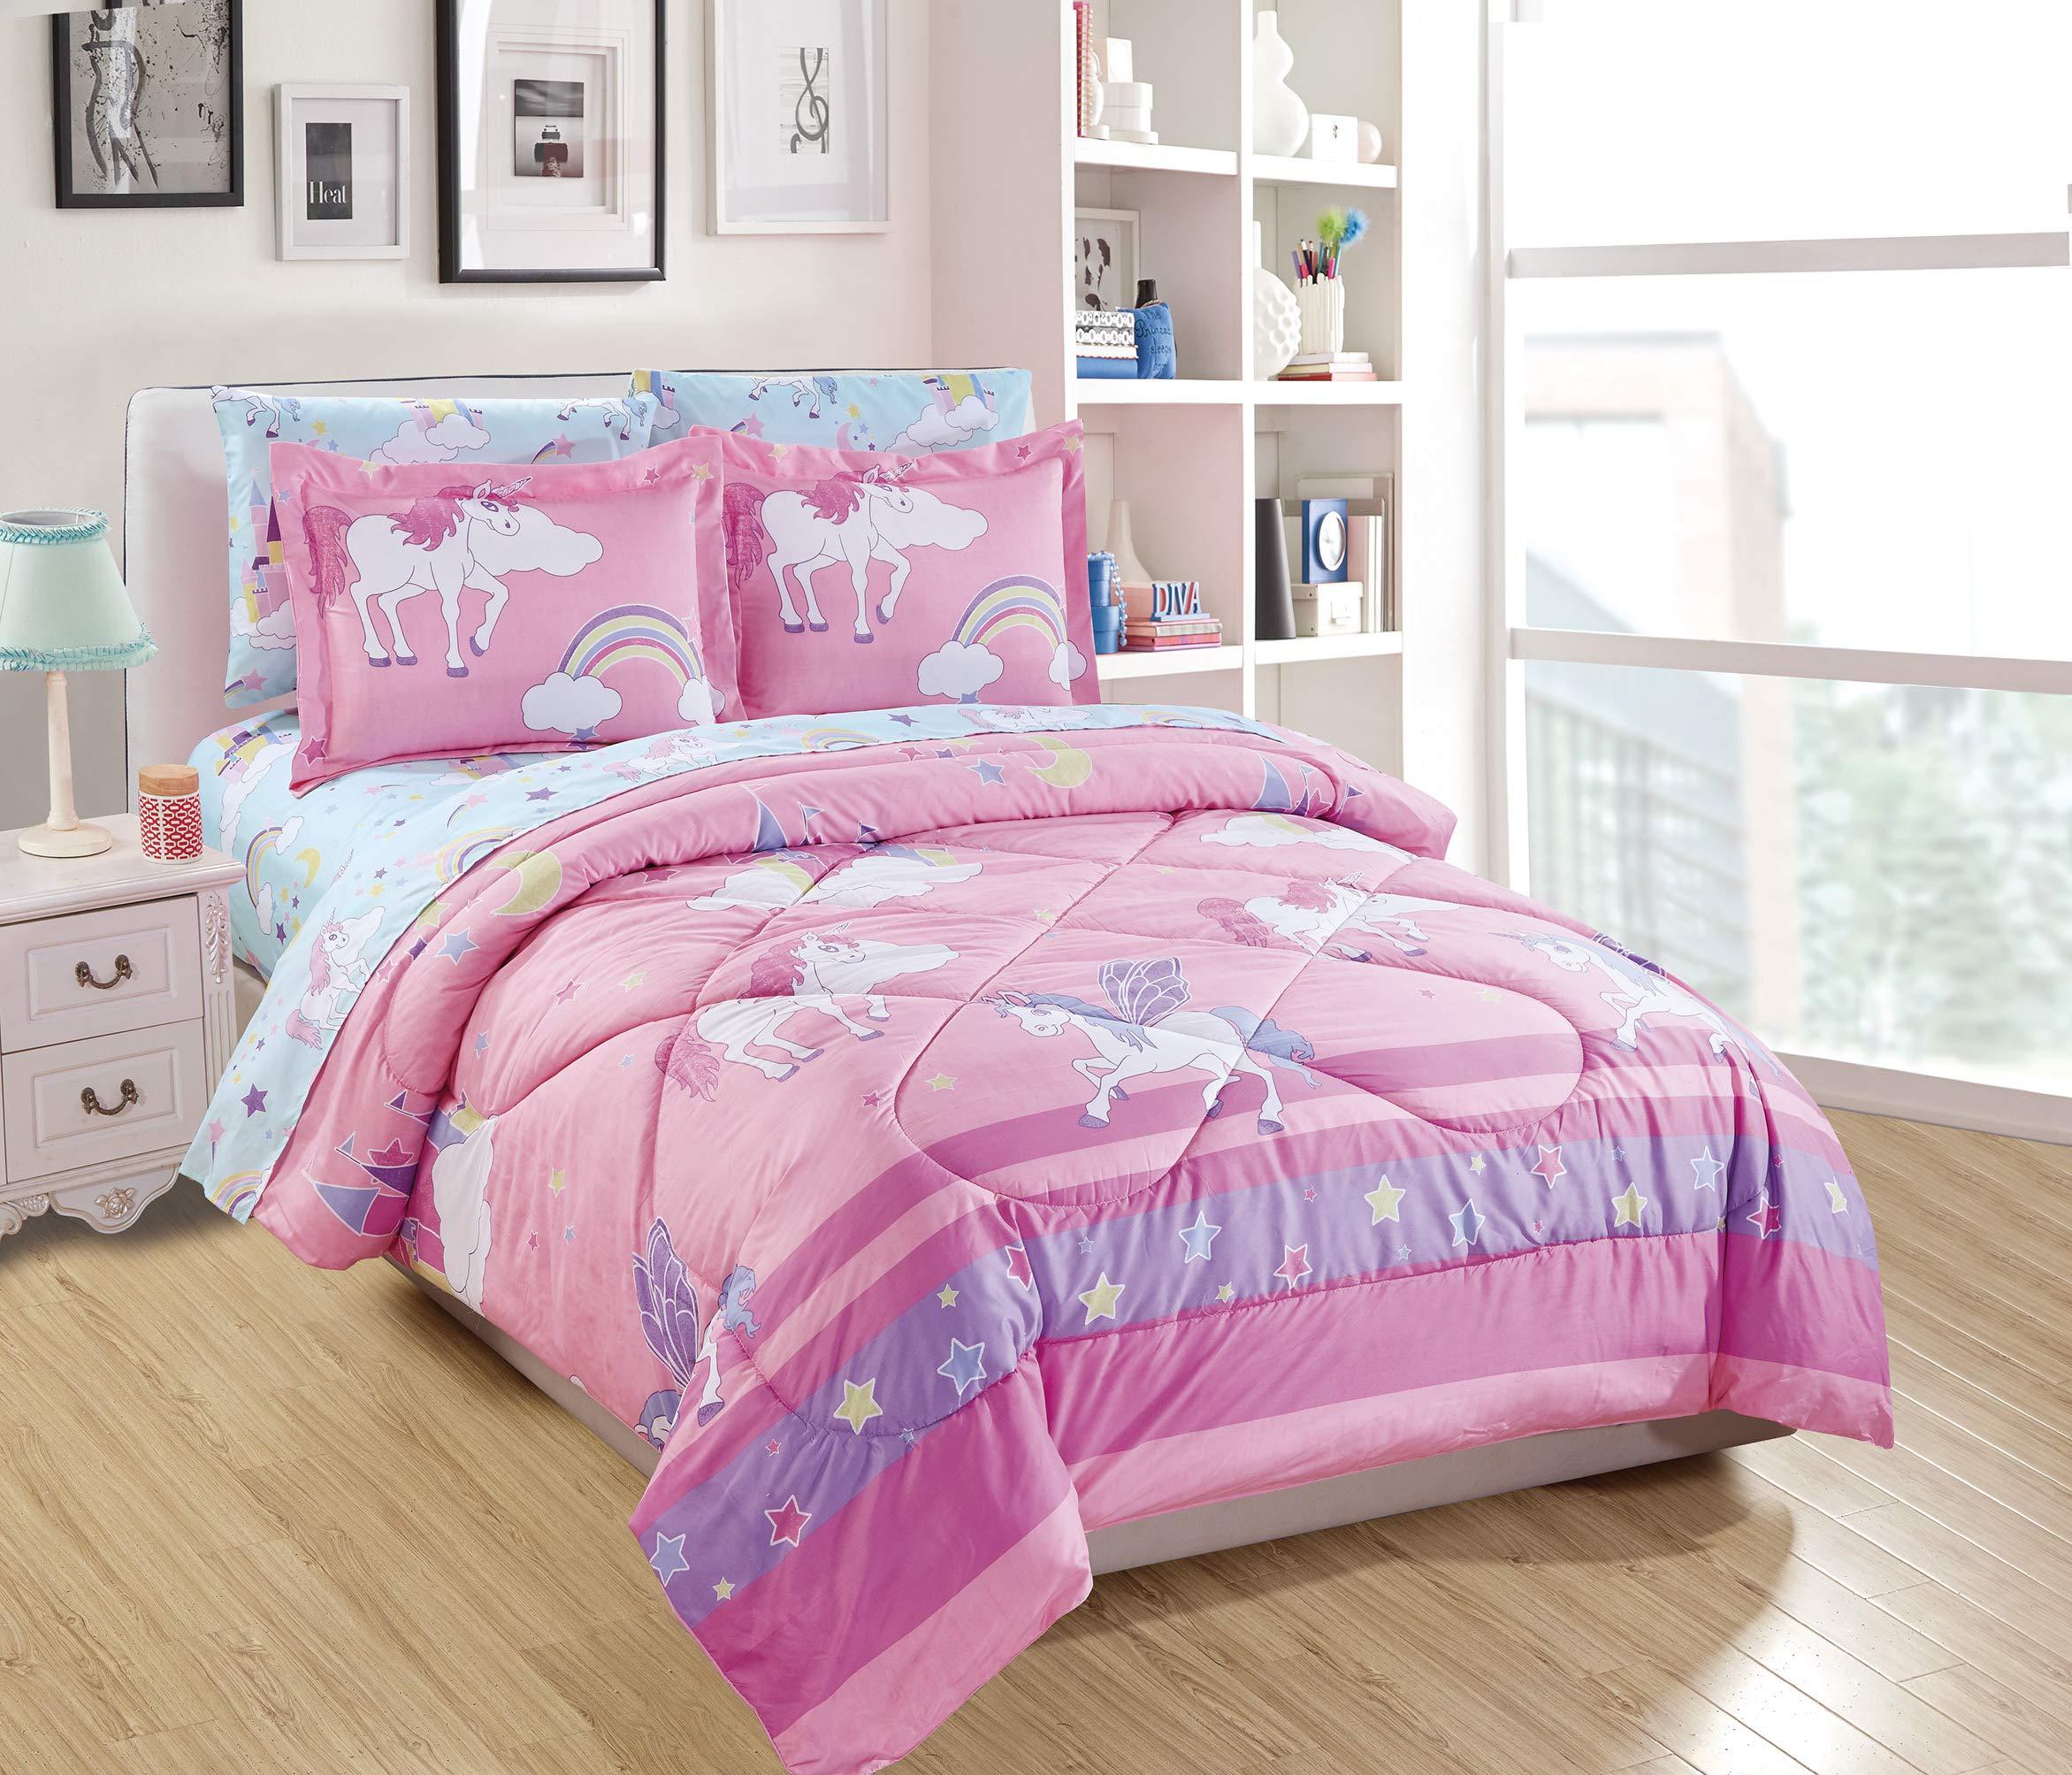 Linen Plus Twin Size 5pc Comforter Set for Girls/Teens Unicorn Rainbow Castle Pink Purple Yellow White New by Linen Plus